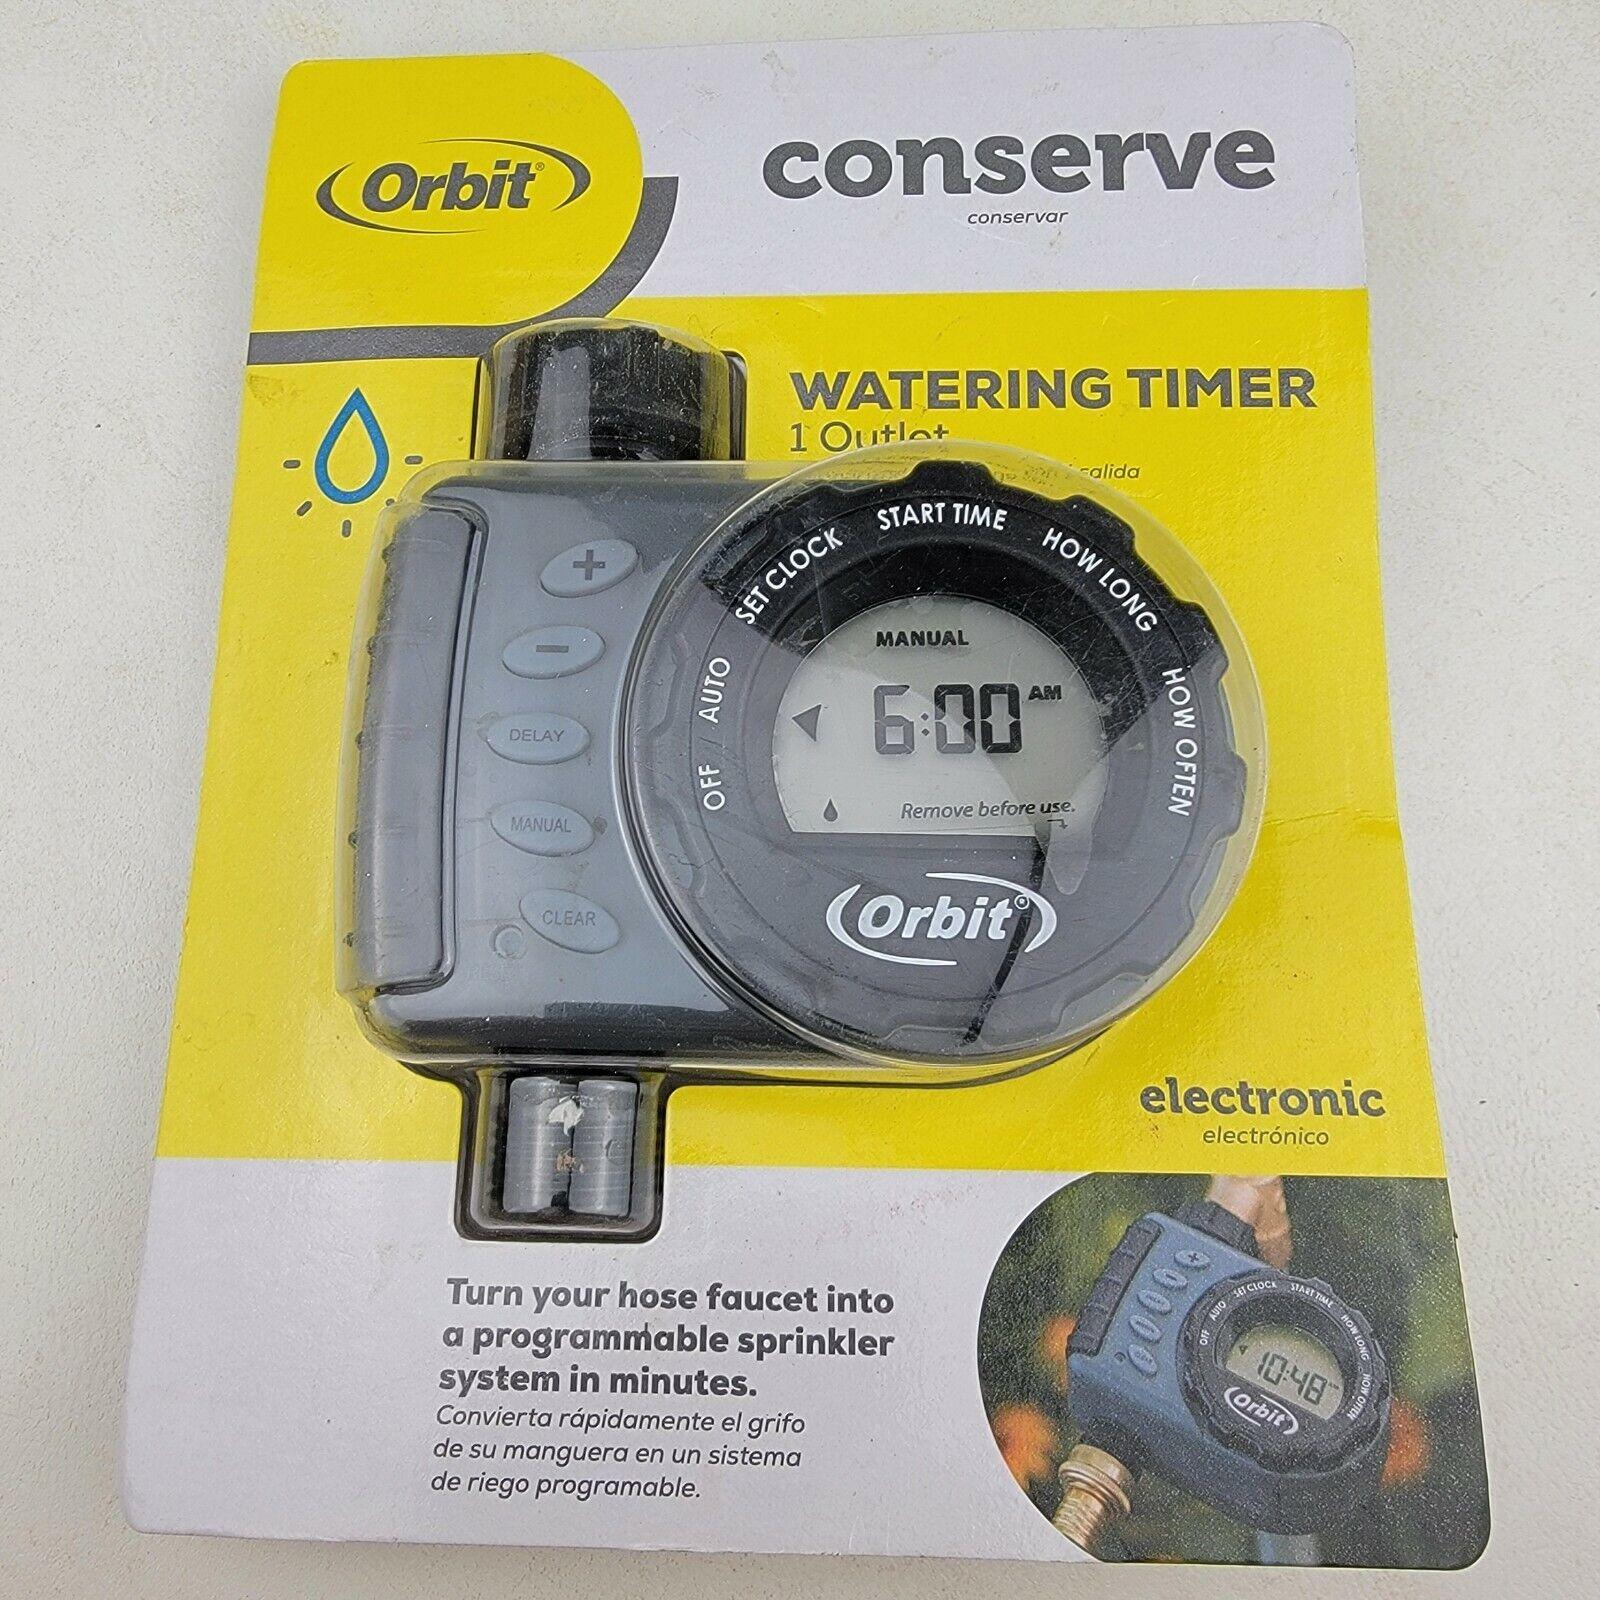 Orbit 24600 Digital Hose Sprinkler Irrigation Timer - 1 Valve Battery Powered